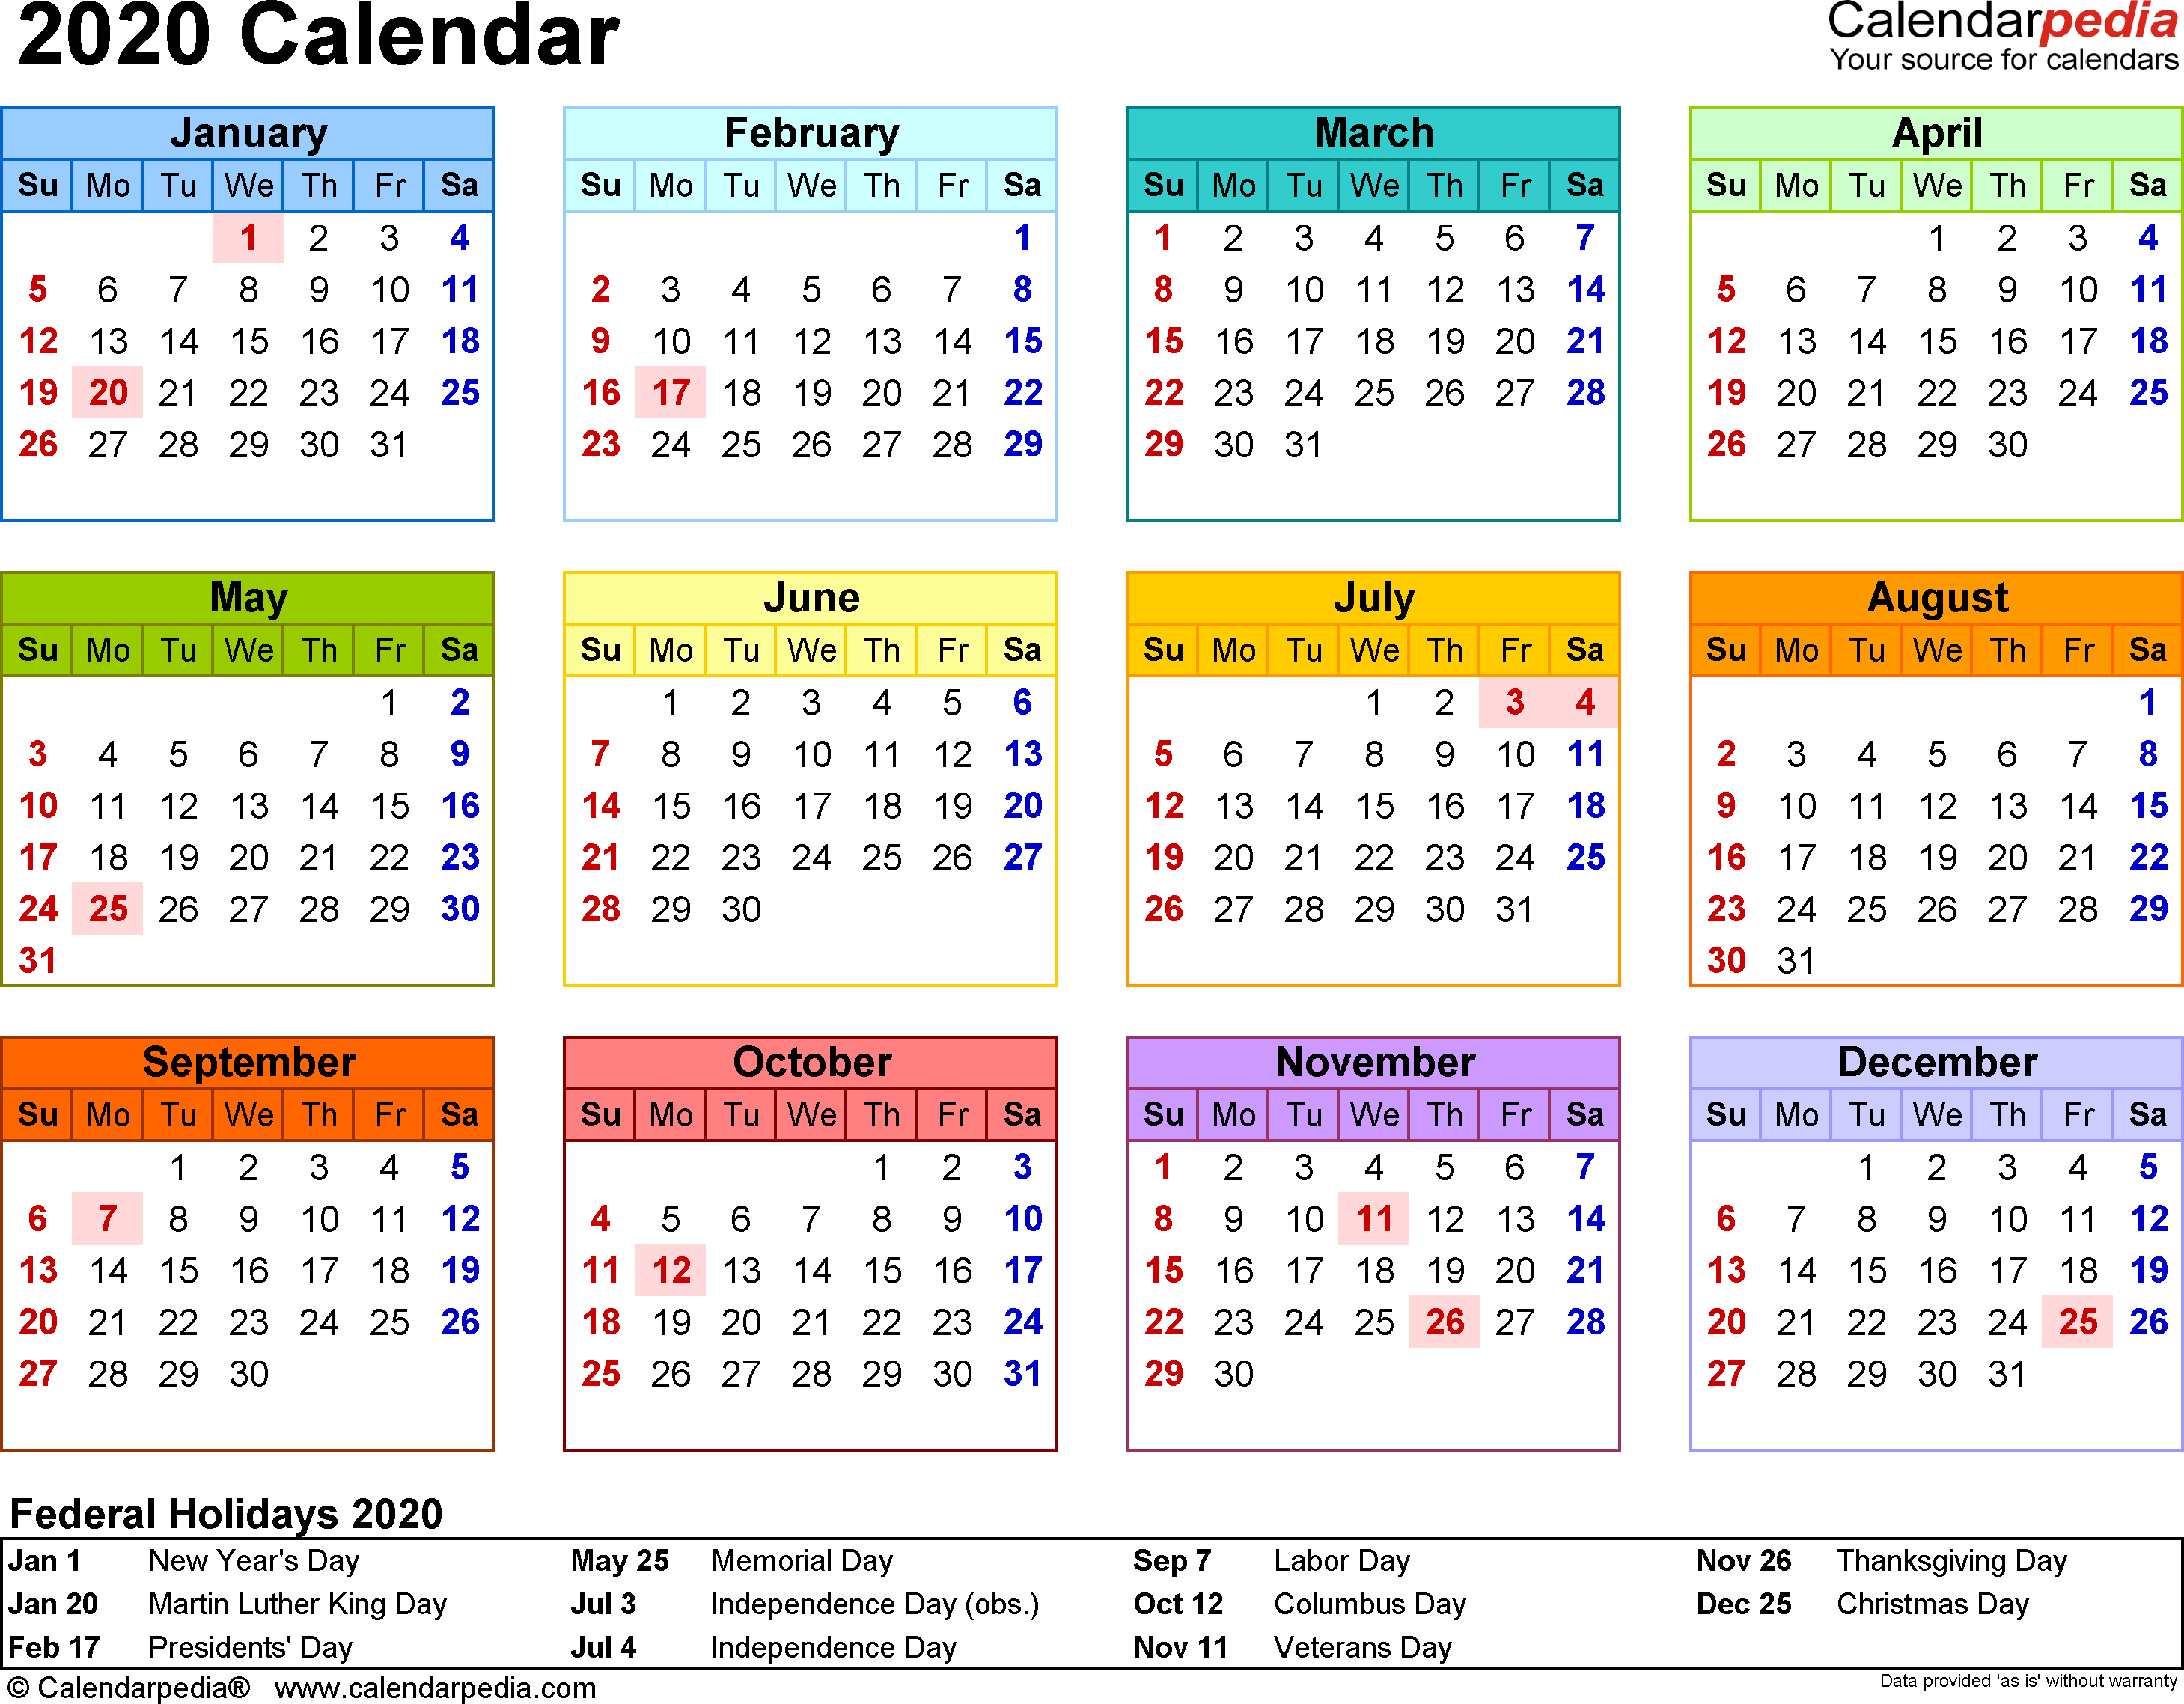 2020 Calendar - 17 Free Printable Word Calendar Templates with Printable Year At Glance Calendar For 2020